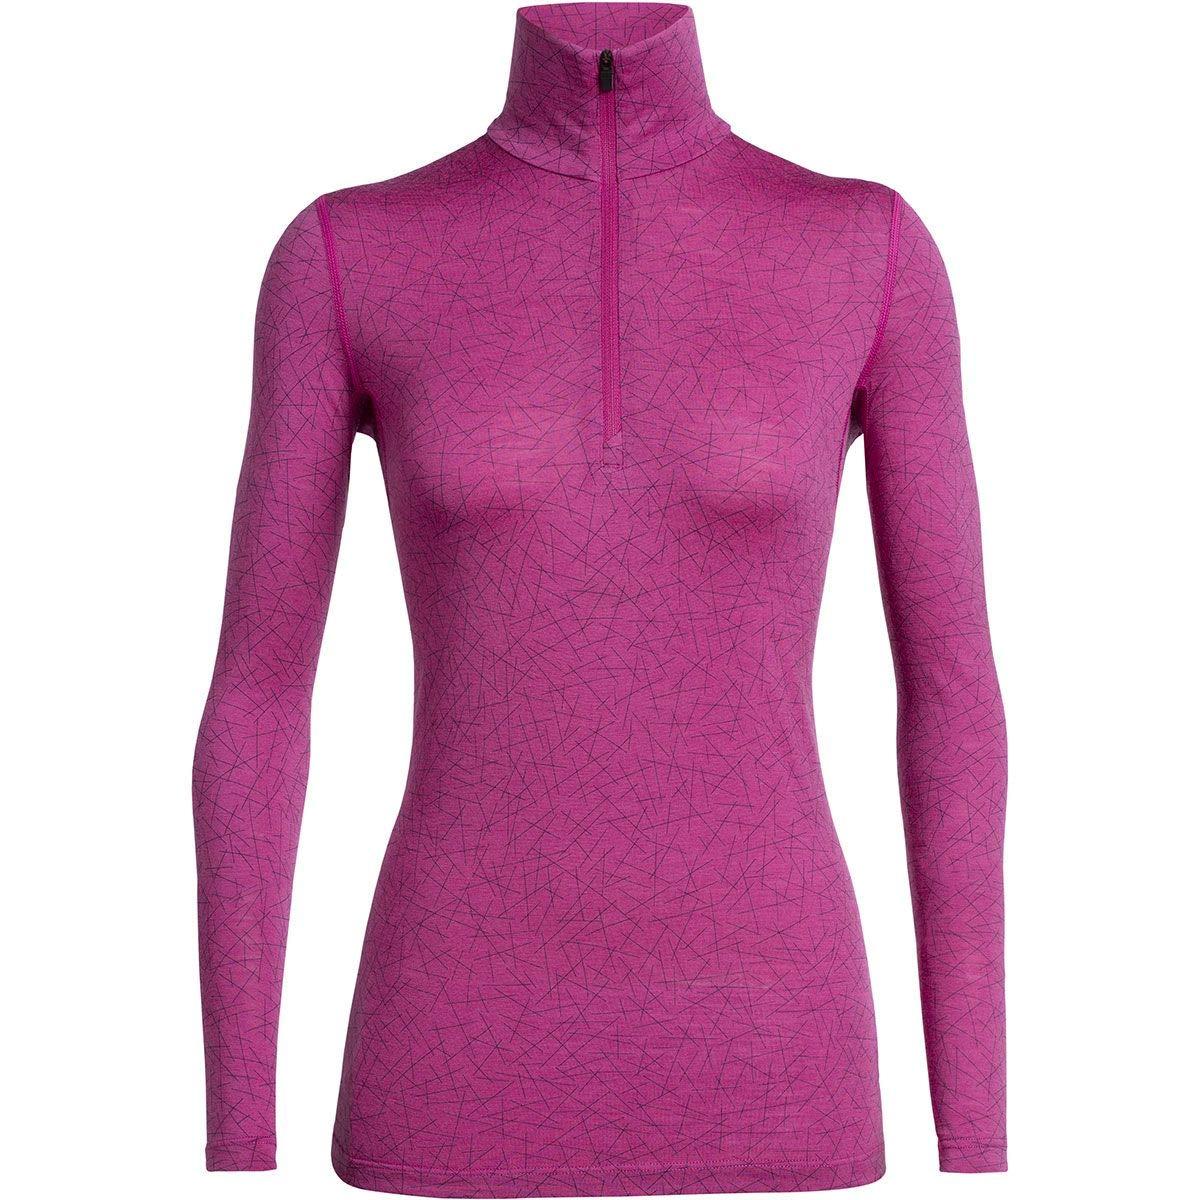 Icebreaker 200 Oasis Longsleeve Half Zip Shirt - Sky Paths - Women - Merinoshirt